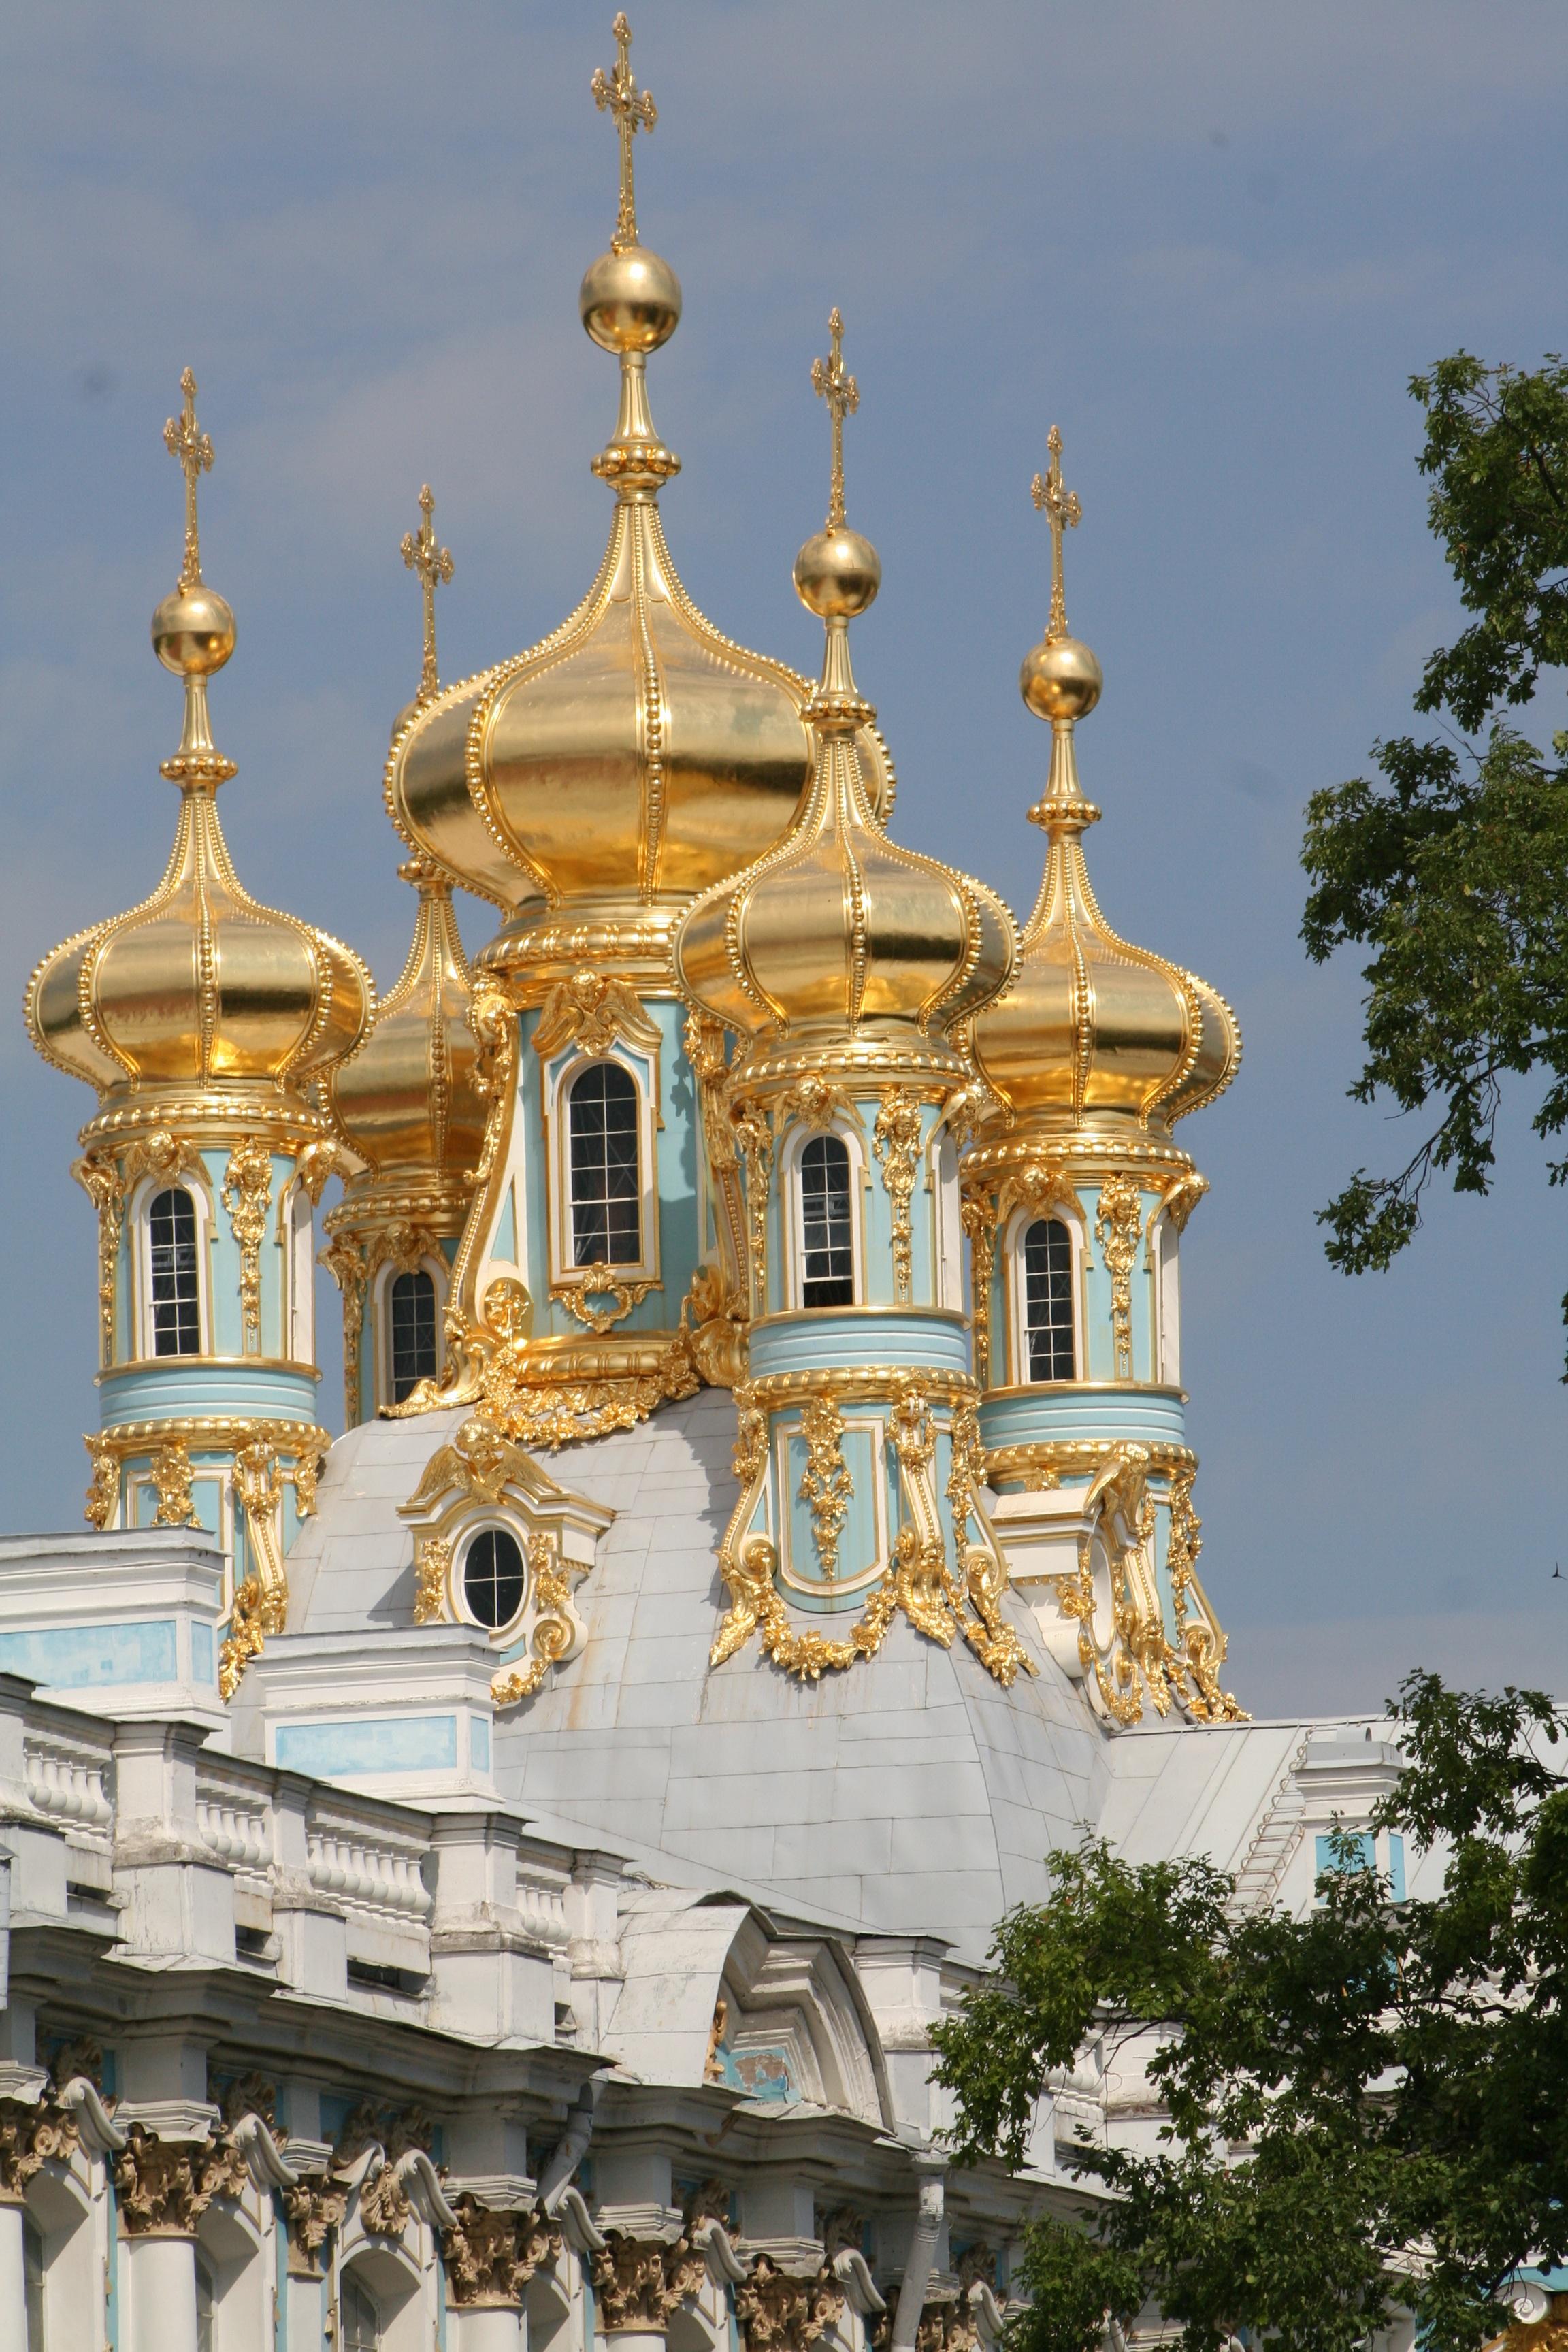 фото купола россии под